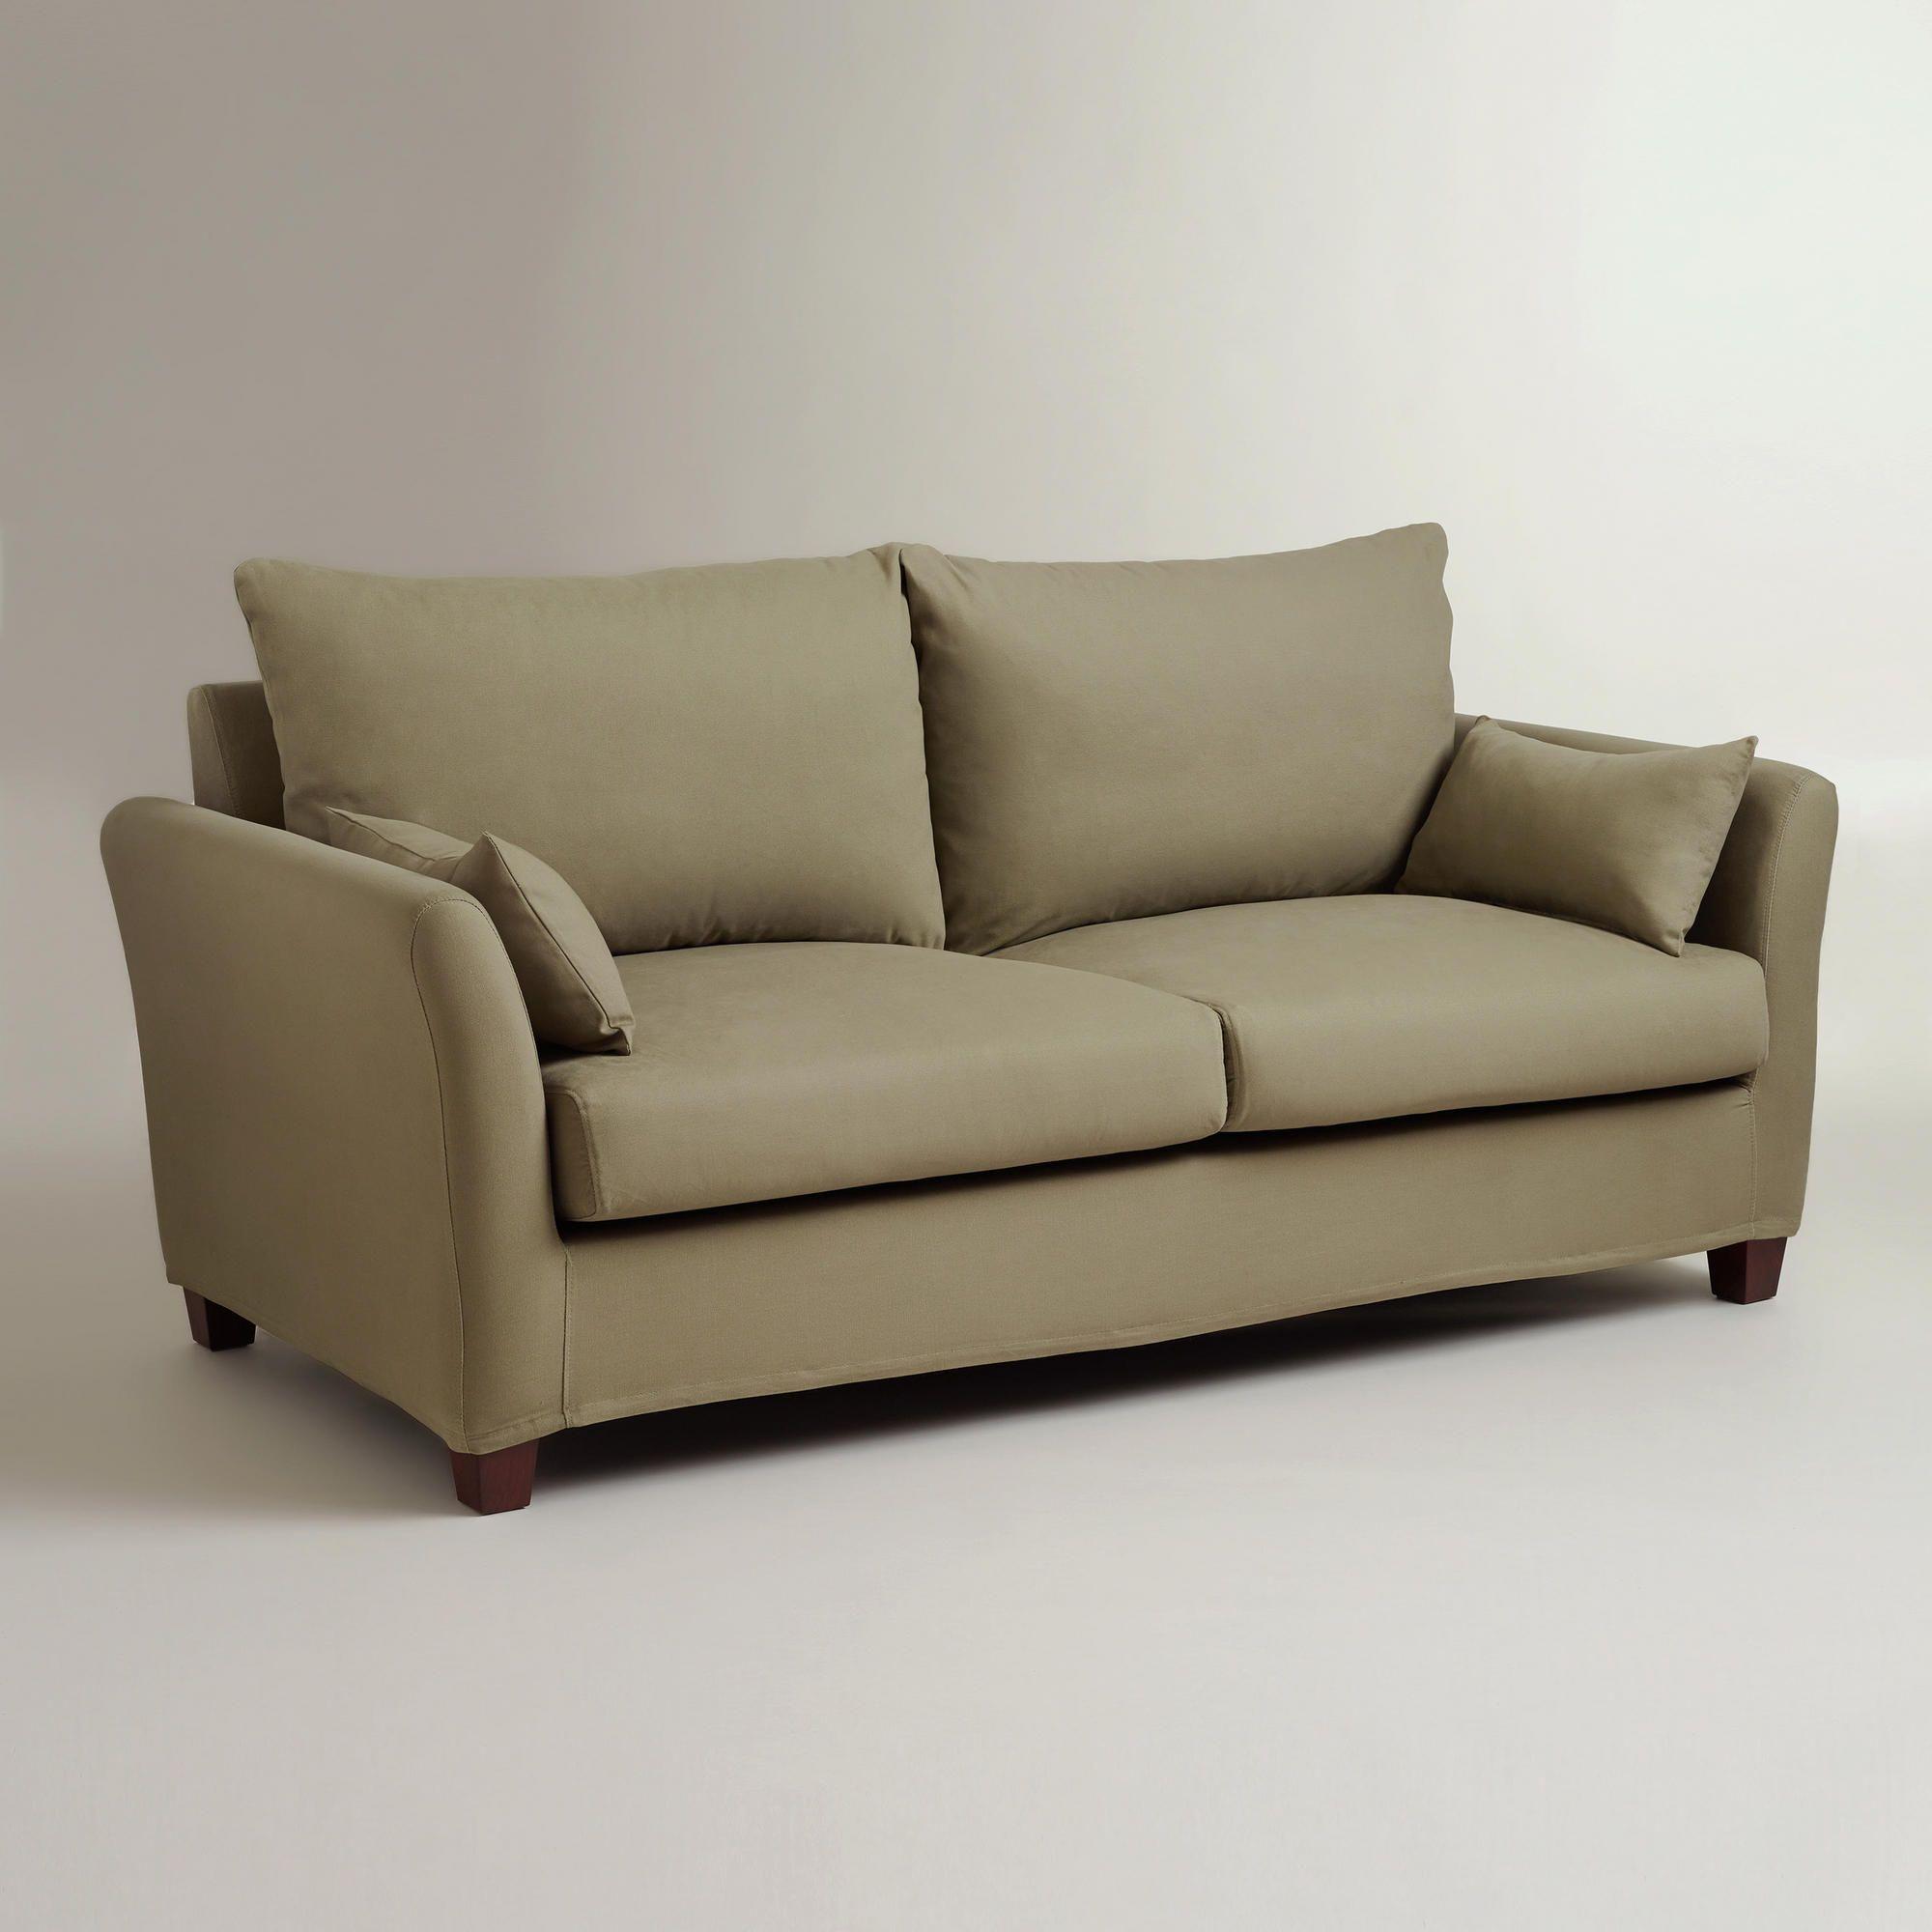 Sage Luxe Sofa Slipcover World Market 1 Next Home